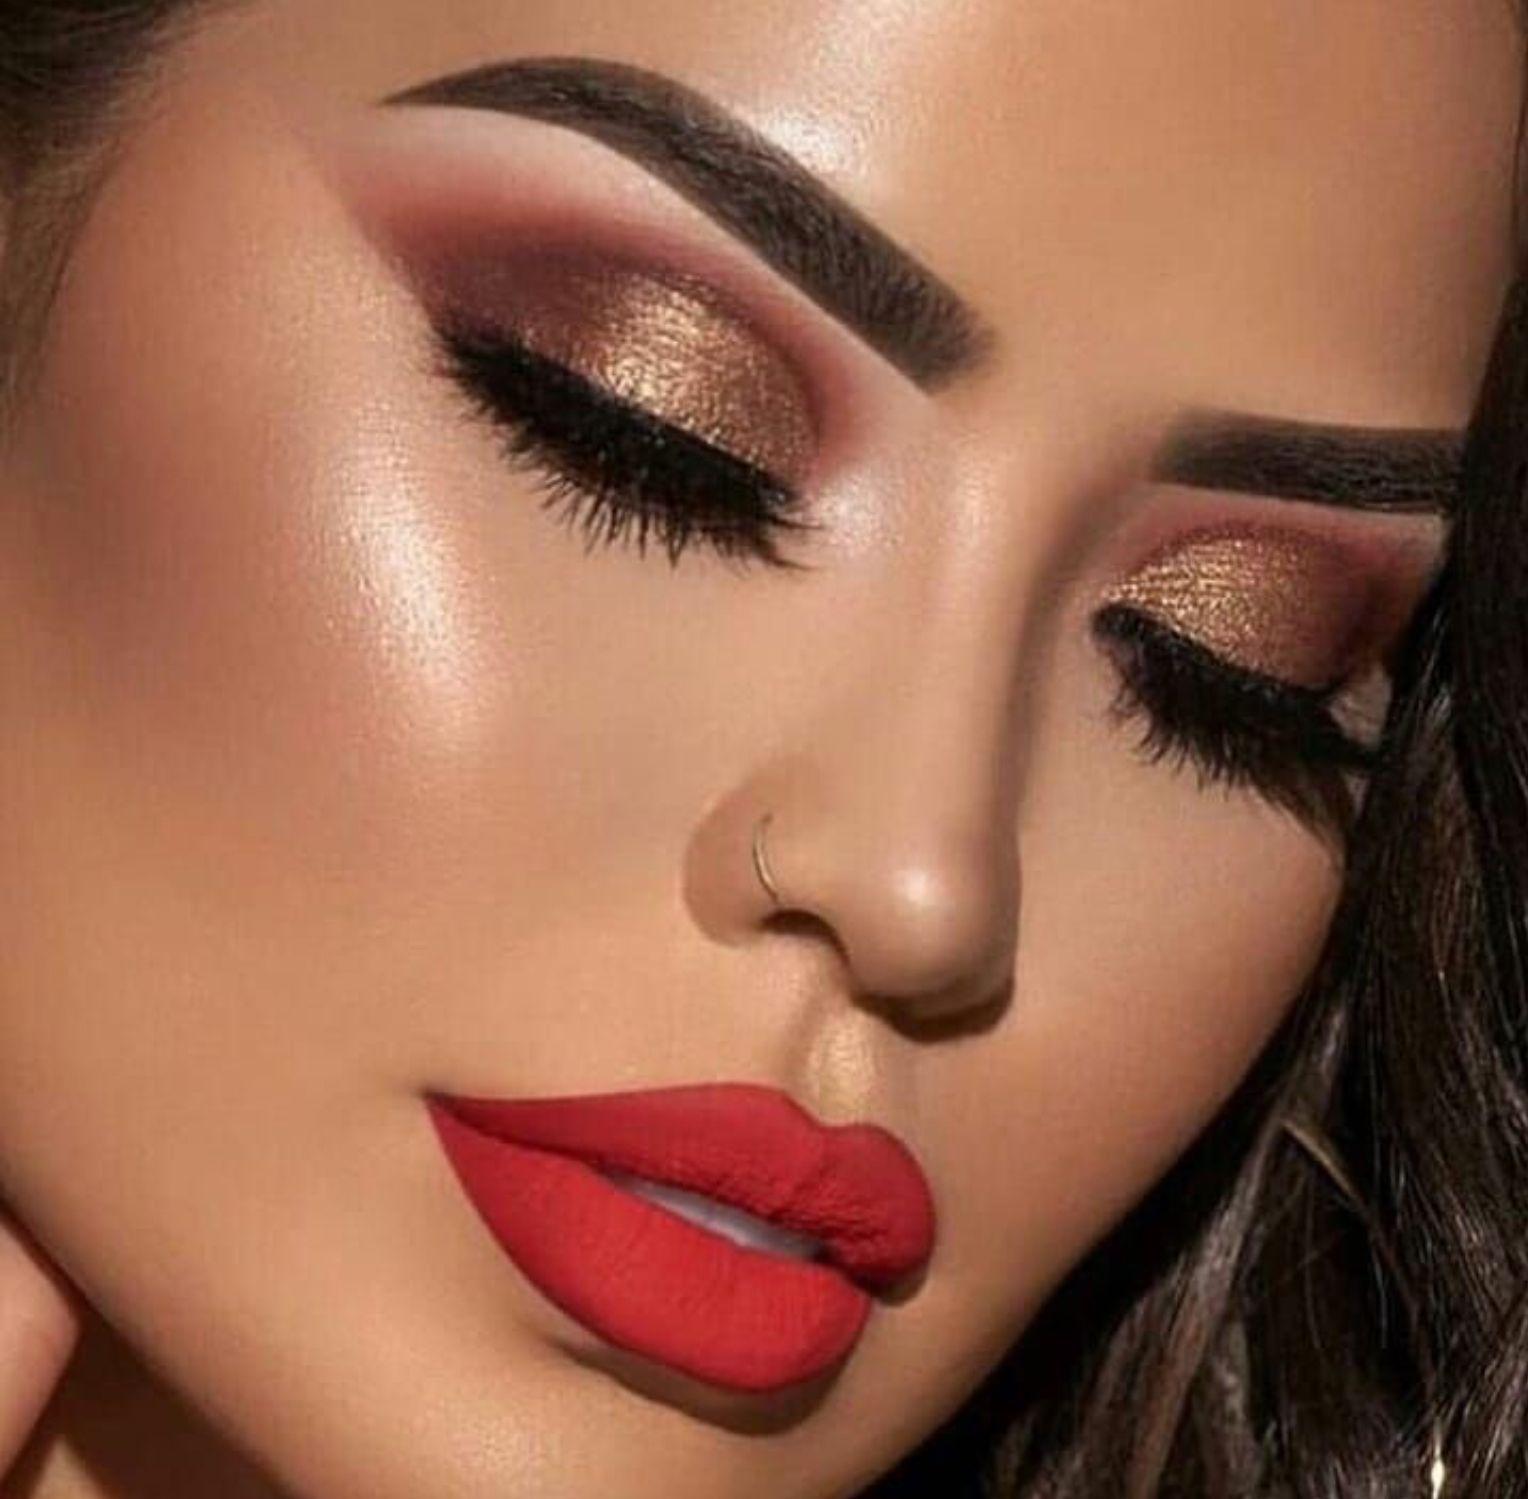 Pin By Brenda Lilas On Beautiful Makeup Prom Eye Makeup Eye Makeup Red Dress Makeup Looks For Red Dress [ 1499 x 1528 Pixel ]